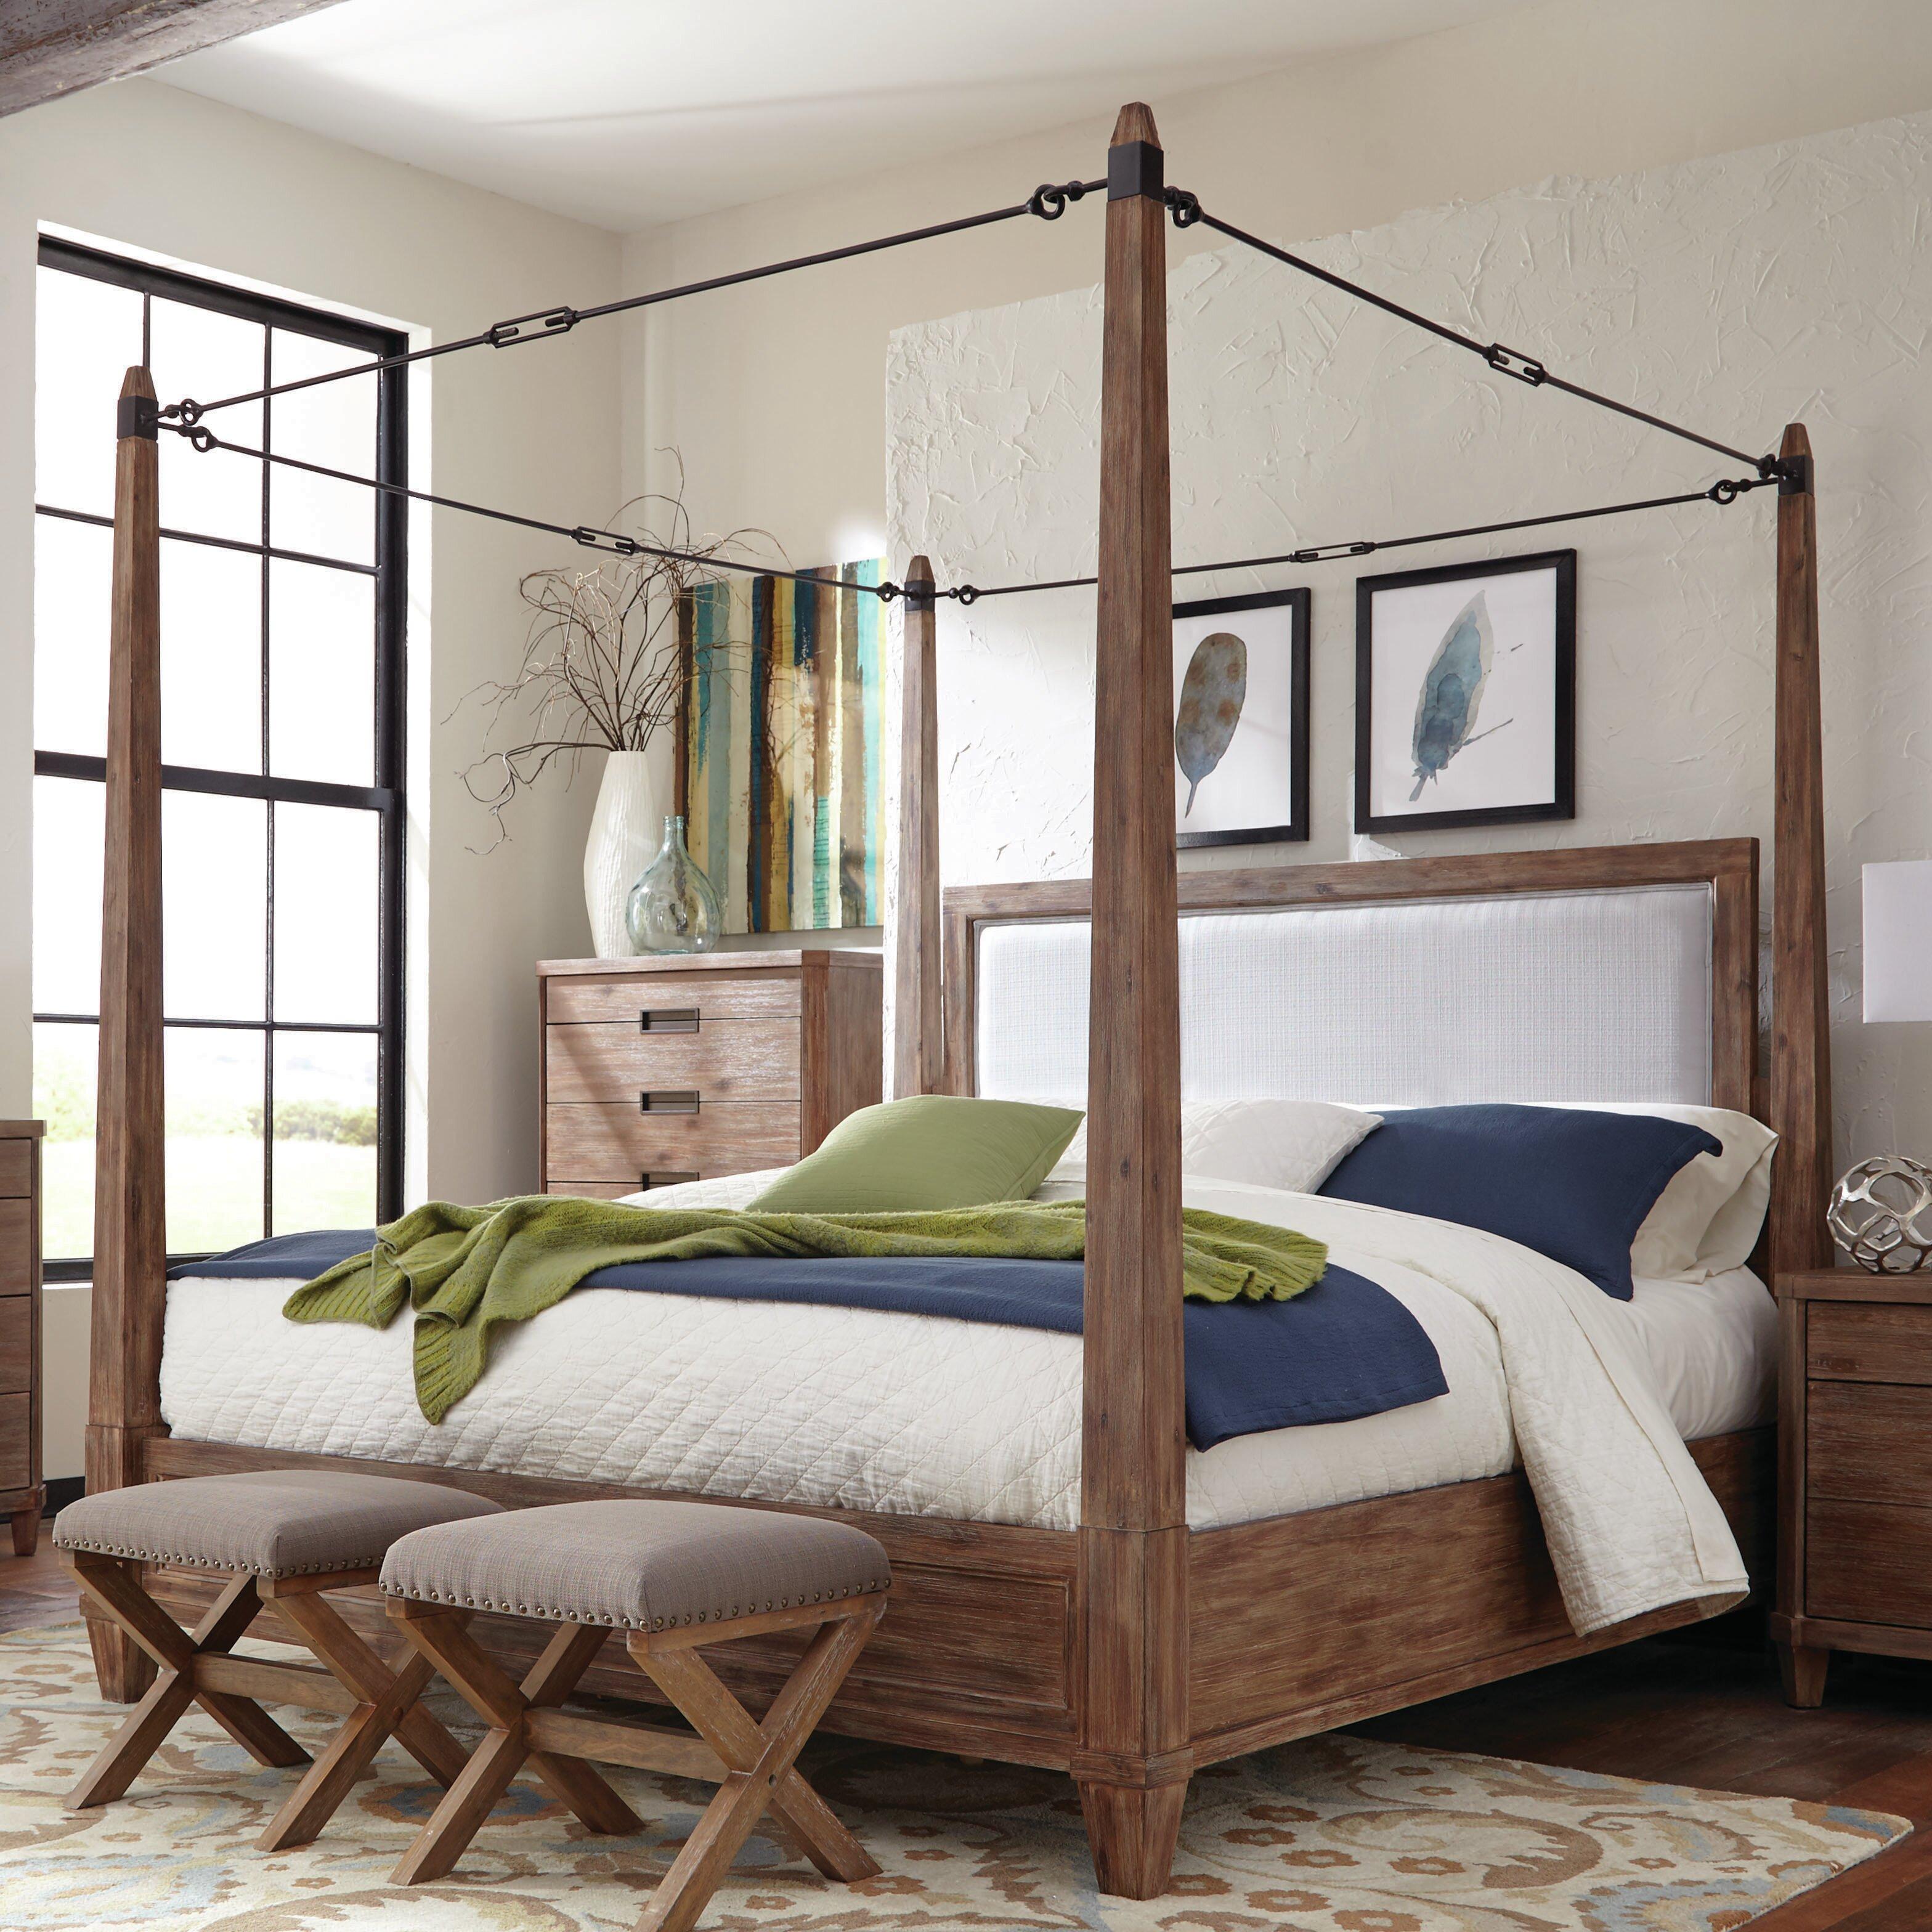 Donny Osmond Home Madeleine Upholstered Canopy Bed. Donny Osmond Madeleine Upholstered Canopy Bed   Reviews   Wayfair